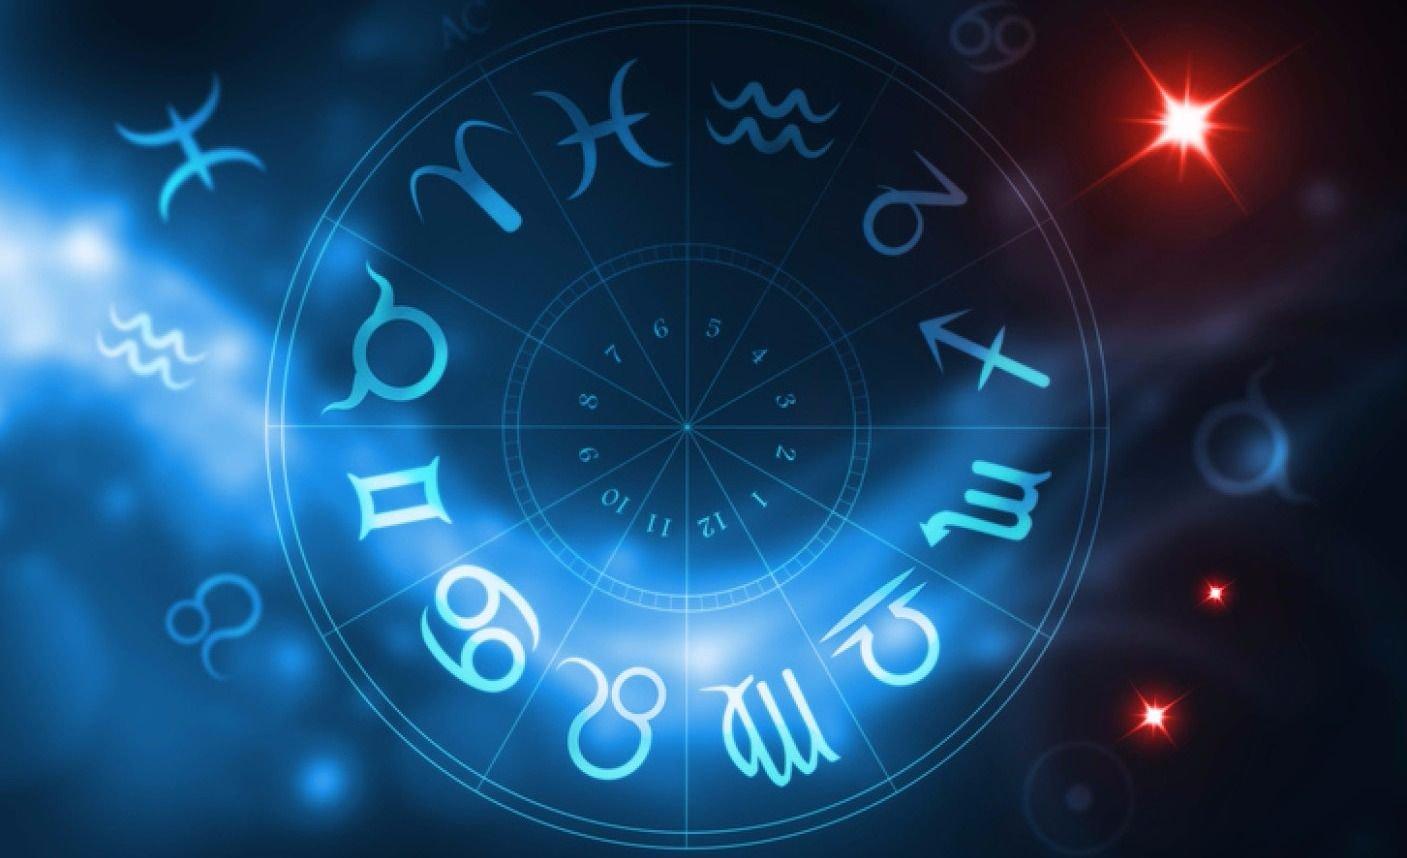 Hor scopo cu les son los signos m s malos del zodiaco - Primer signo del zodiaco ...